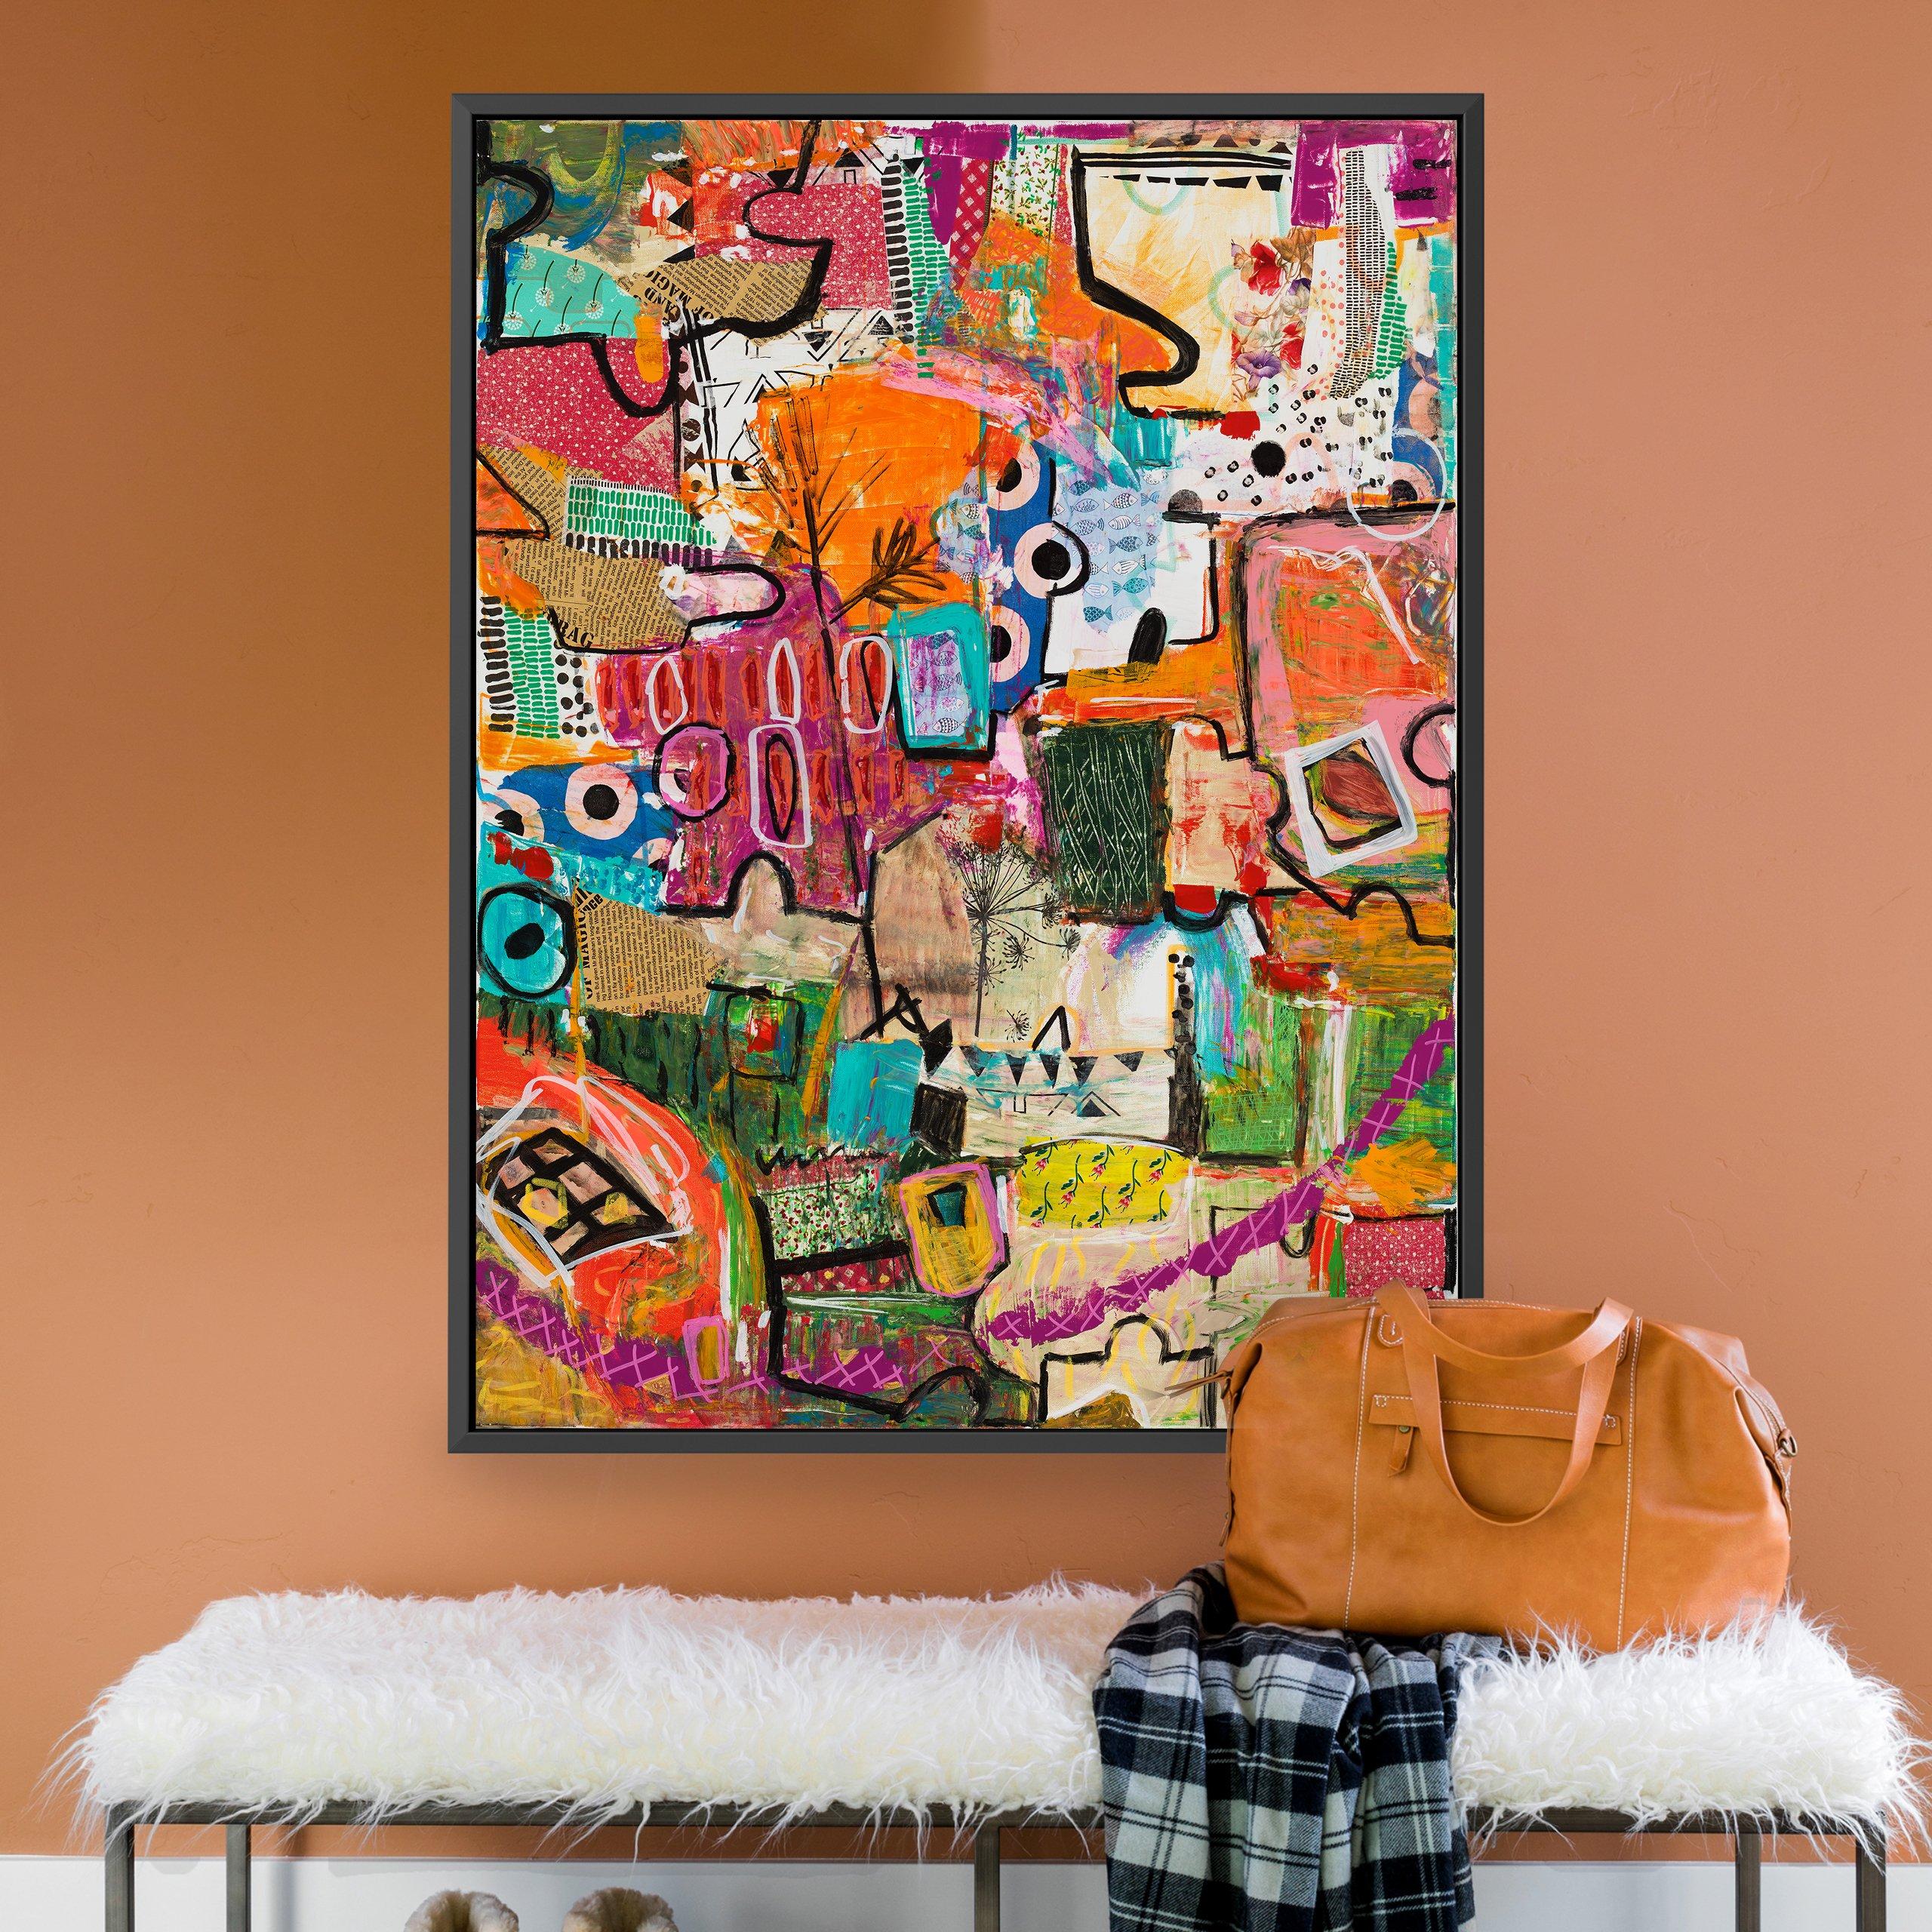 michal-rotma-laor-large-abstract-art